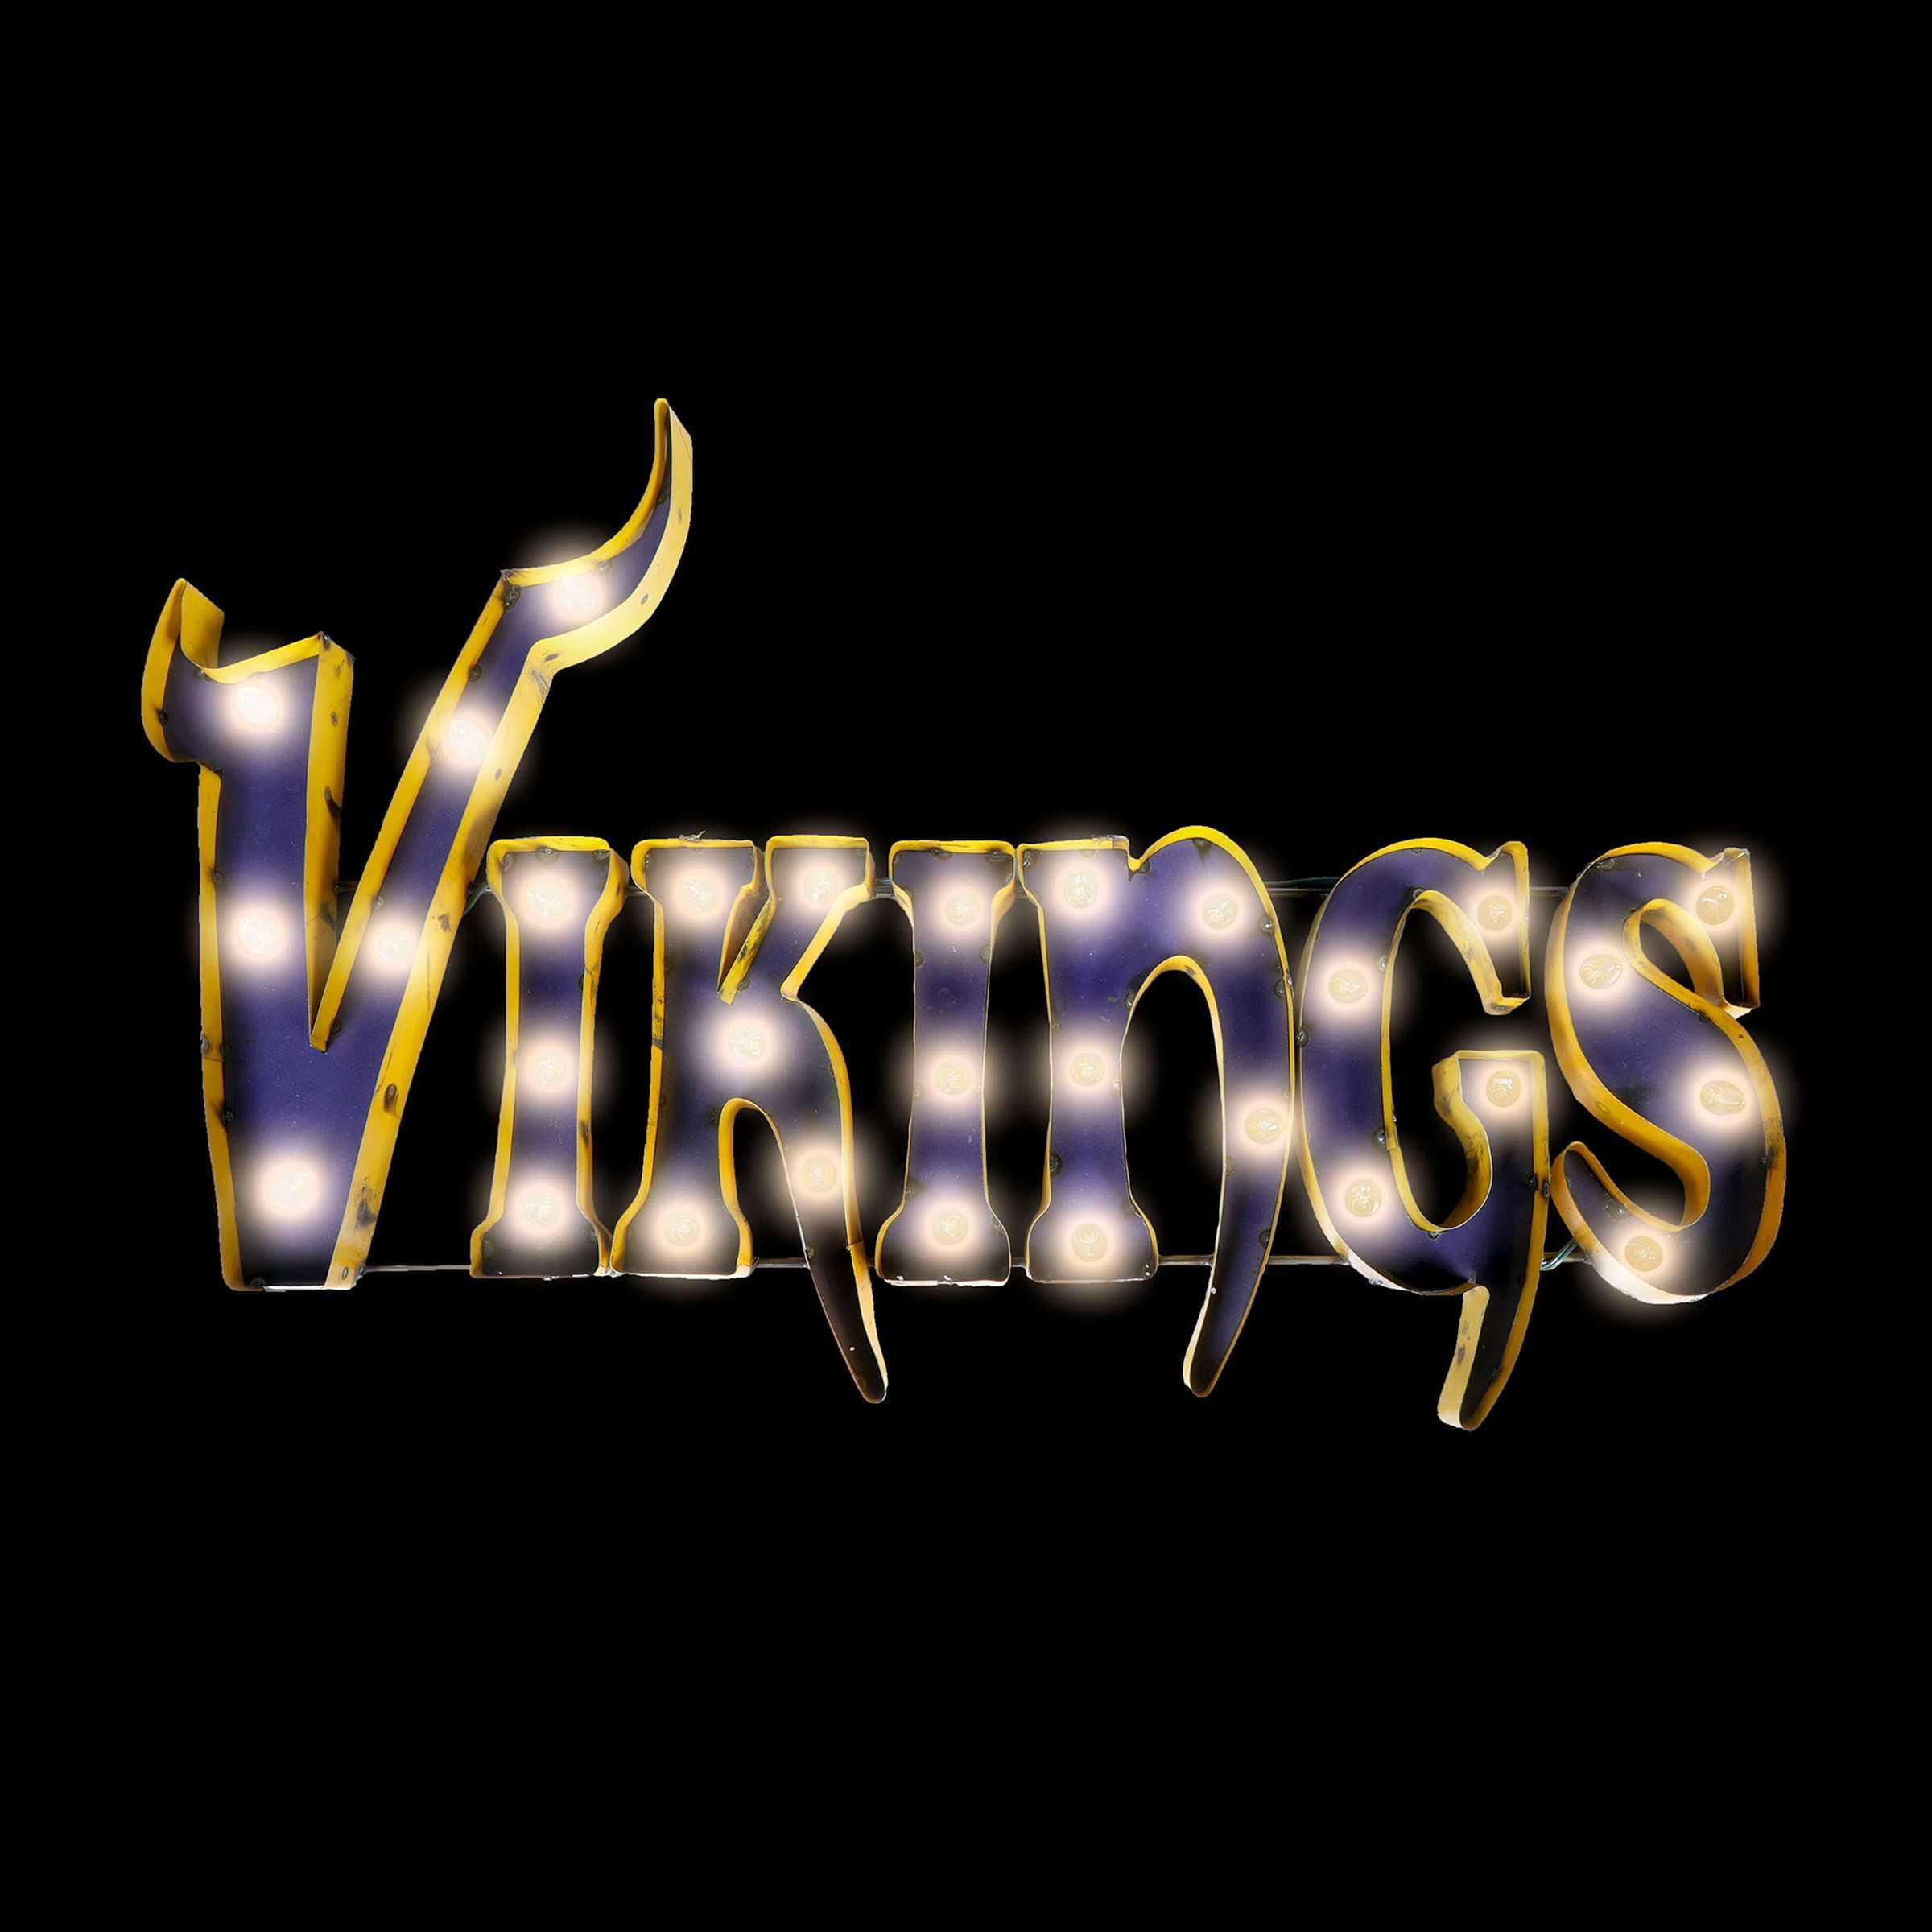 MINNESOTA VIKINGS Lighted Recycled Metal Sign